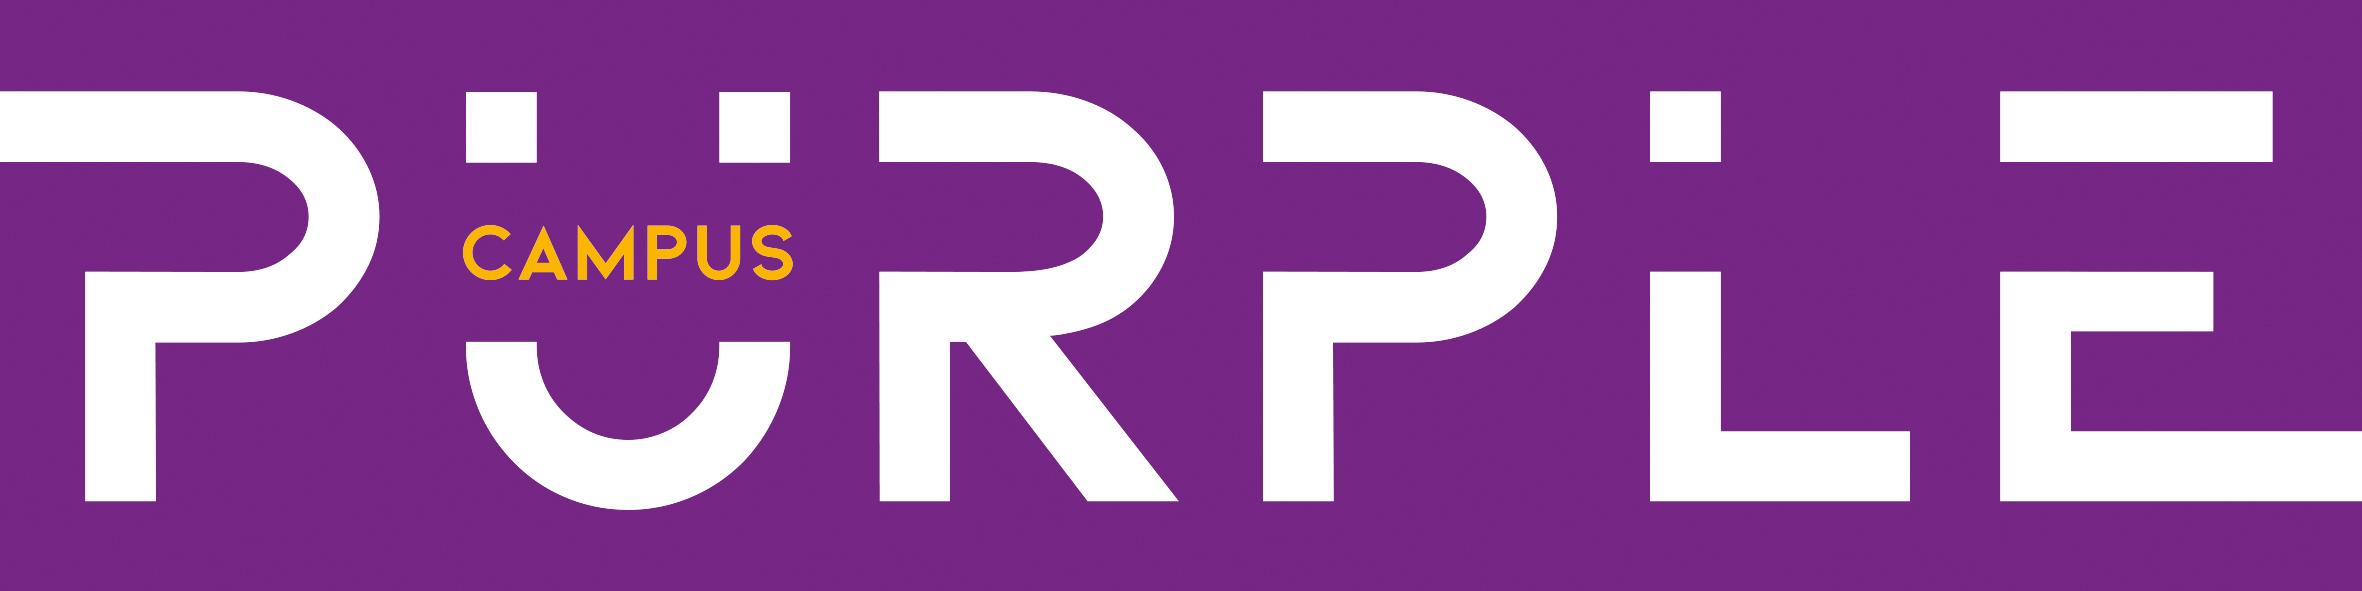 1. Logo PURPLE Horizontal quadri